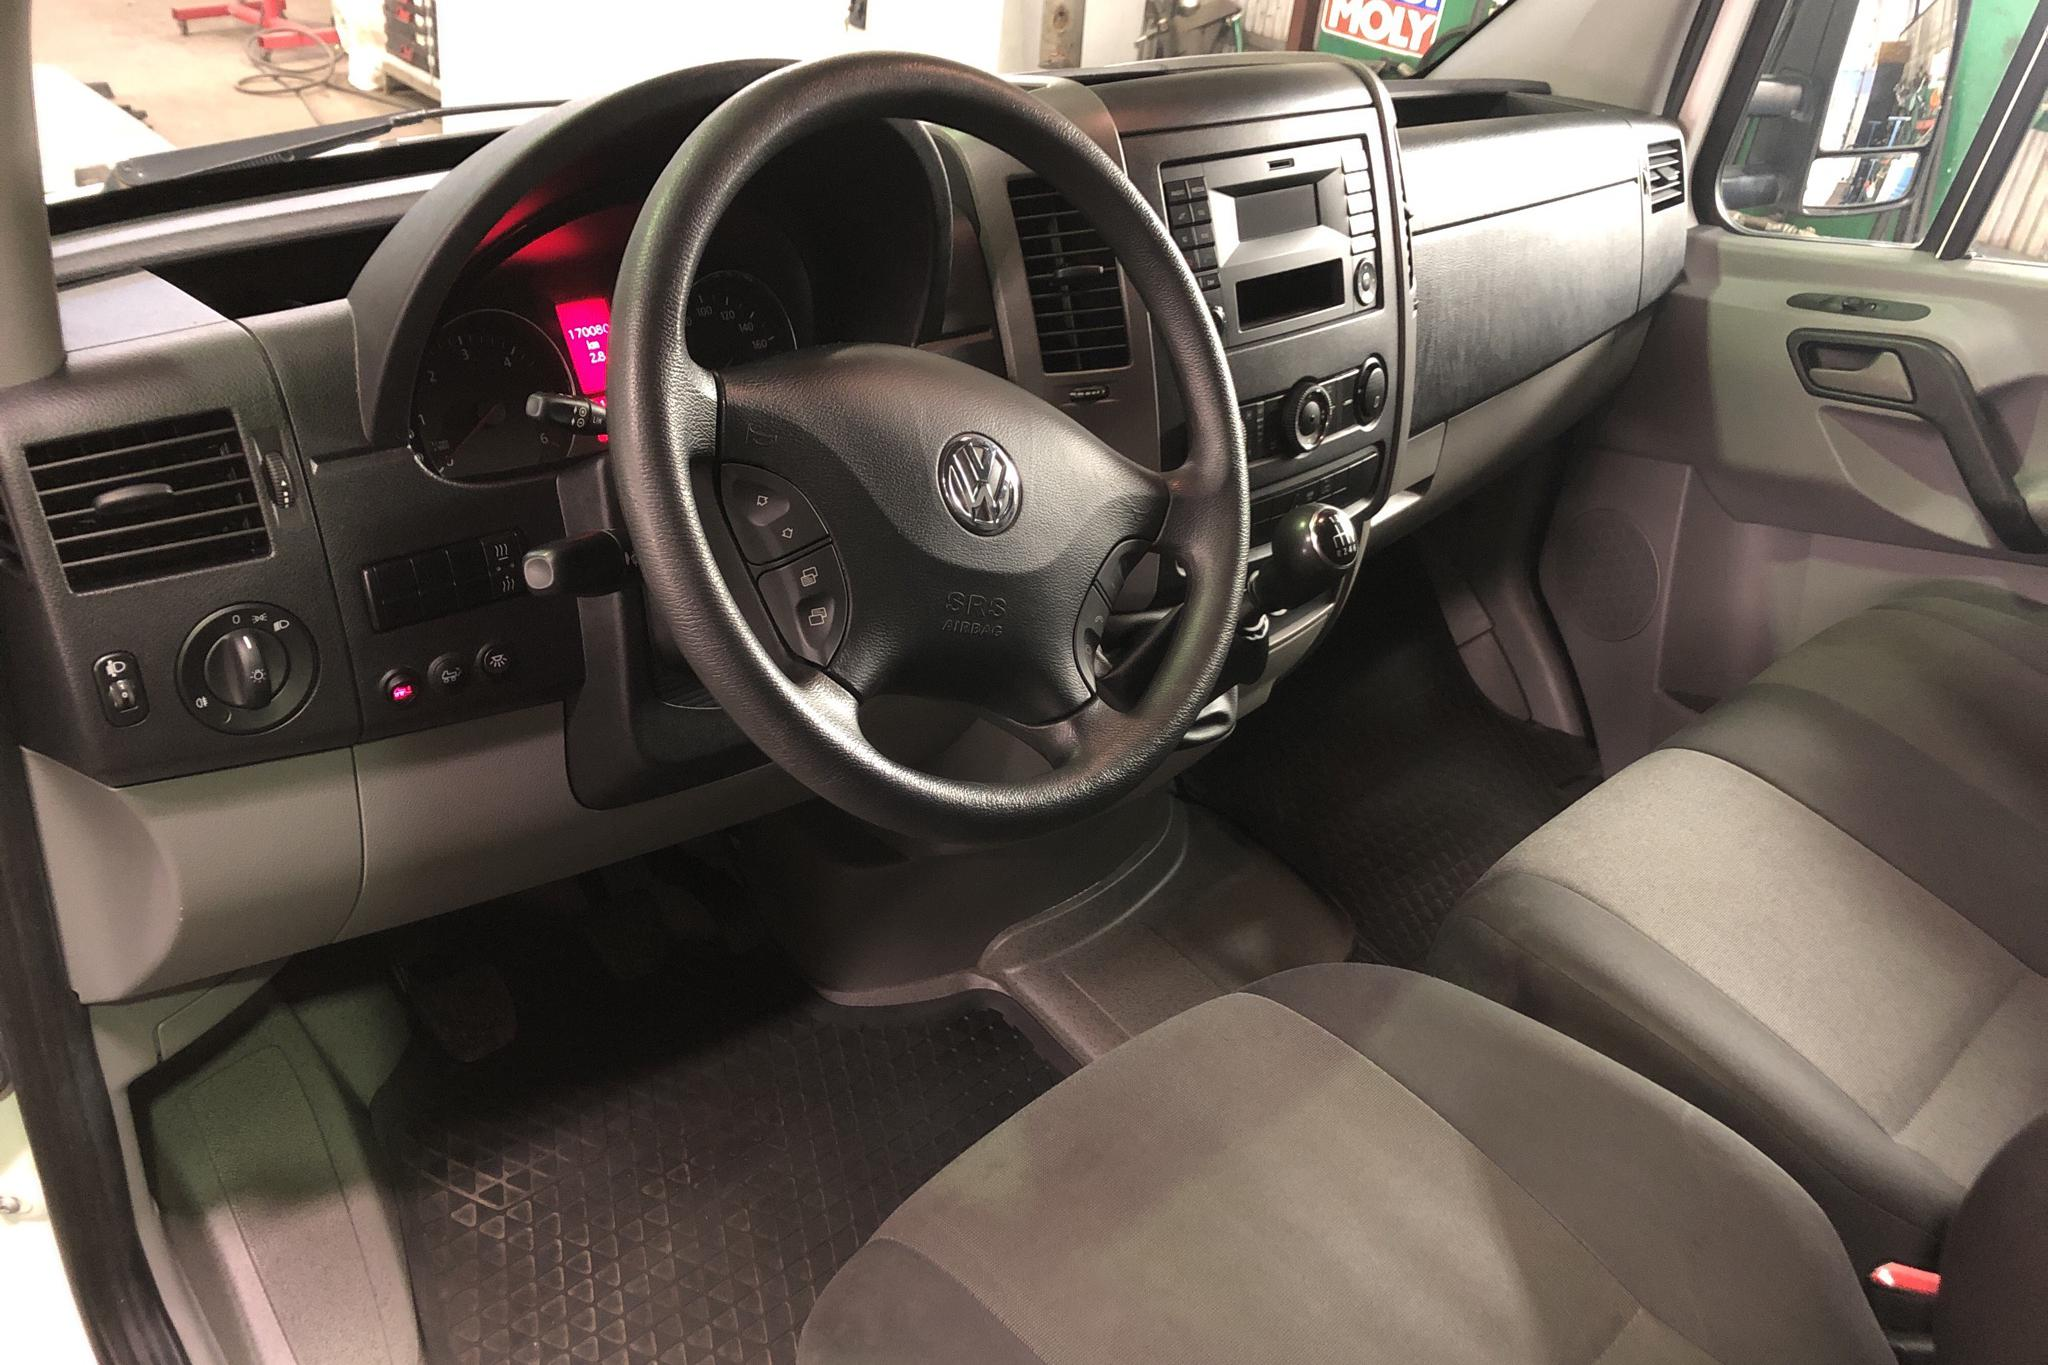 VW Crafter 35 2.0 TDI Volymskåp (163hk) - 170 080 km - Manual - white - 2016